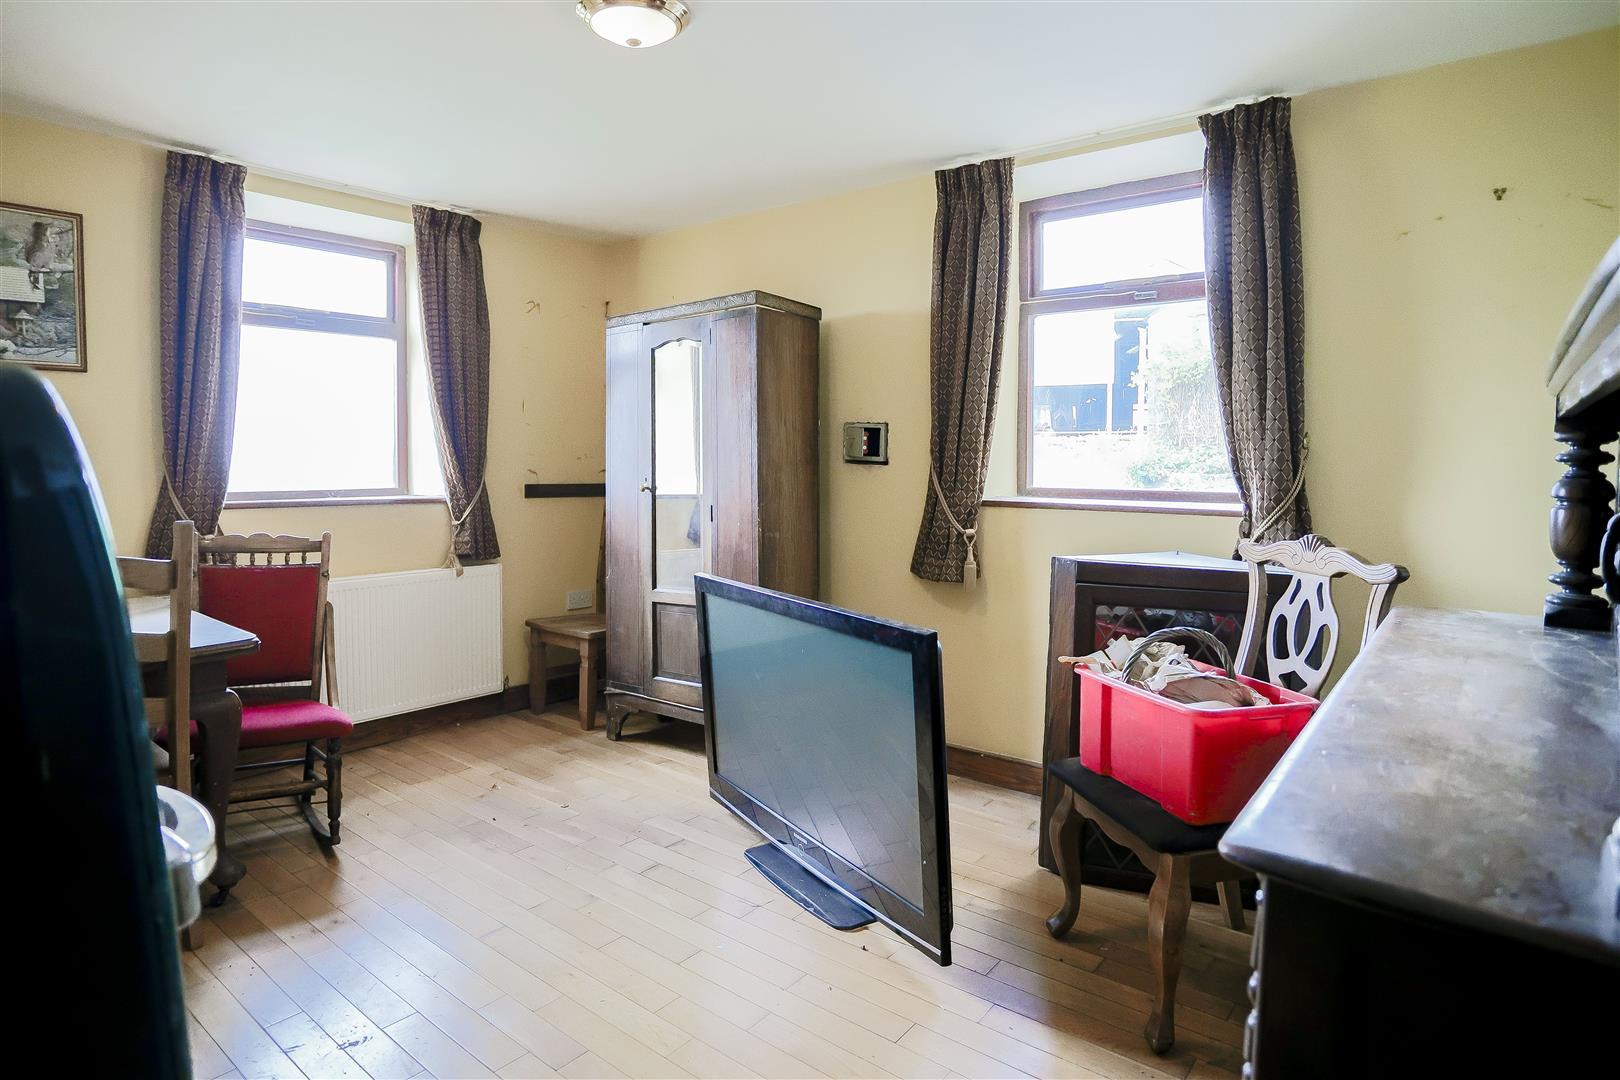 2 Bedroom Barn Conversion For Sale - IMG_2401.jpg